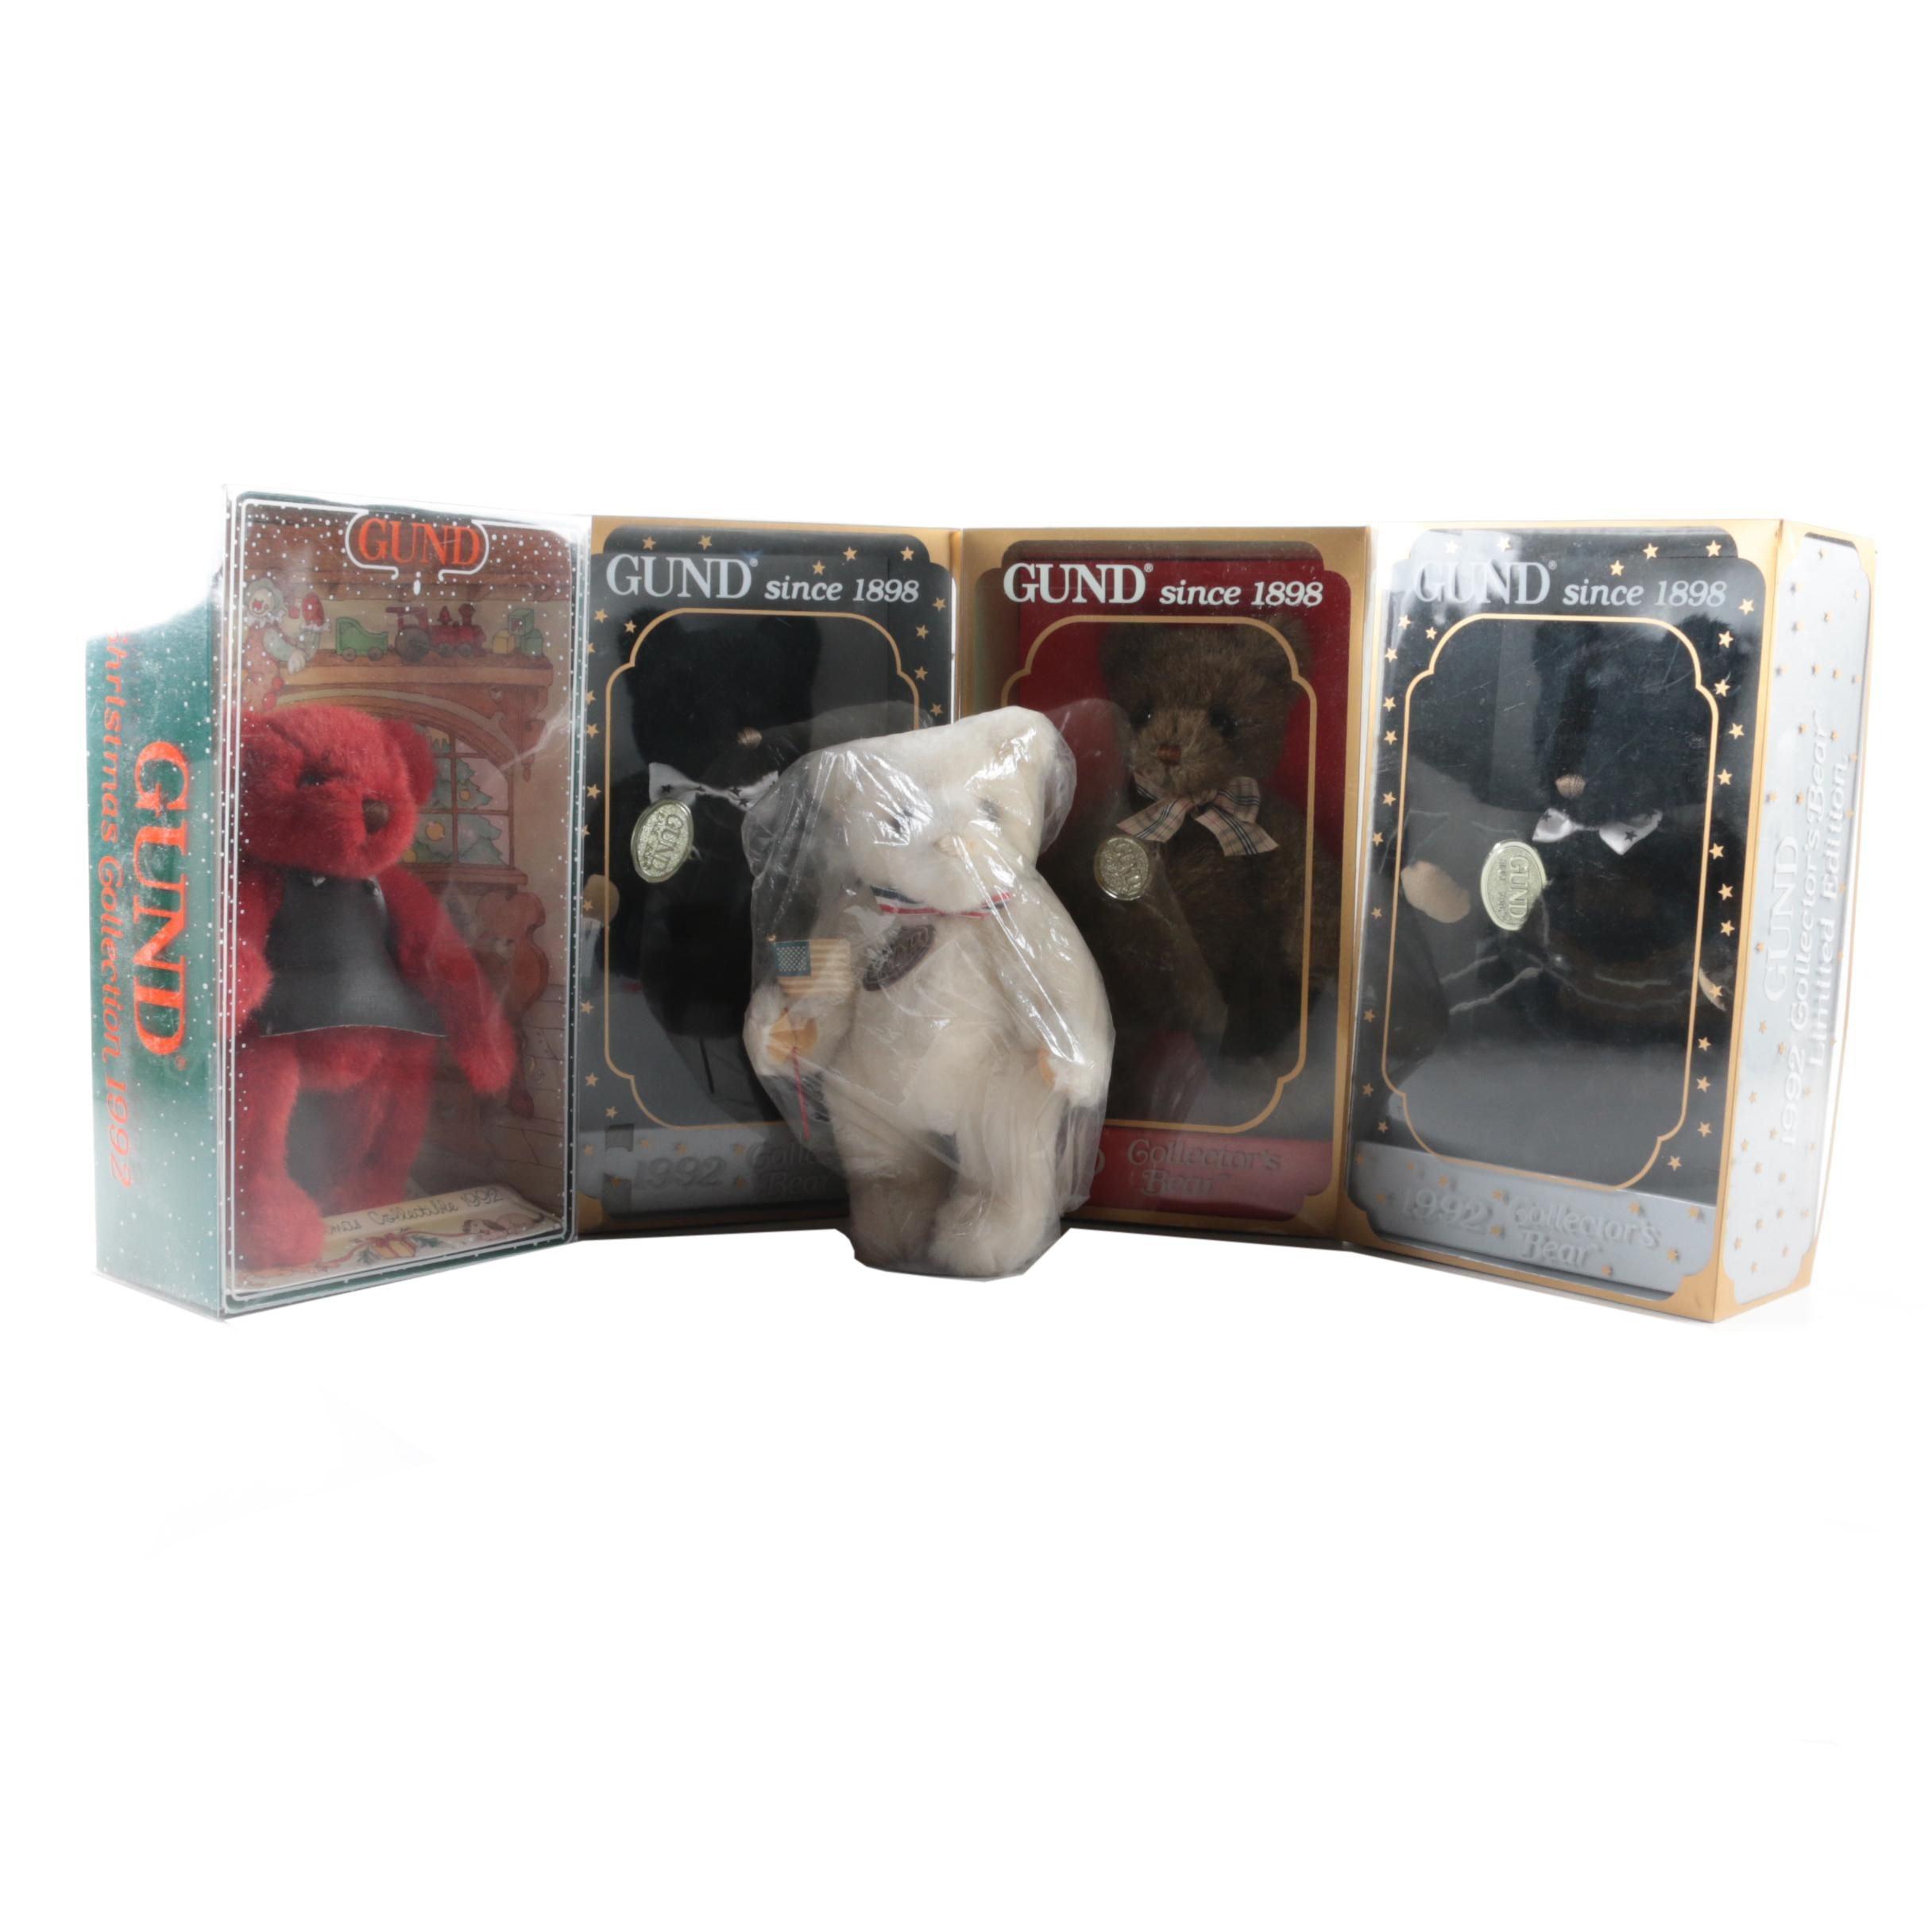 1990s Gund Limited Edition Teddy Bears